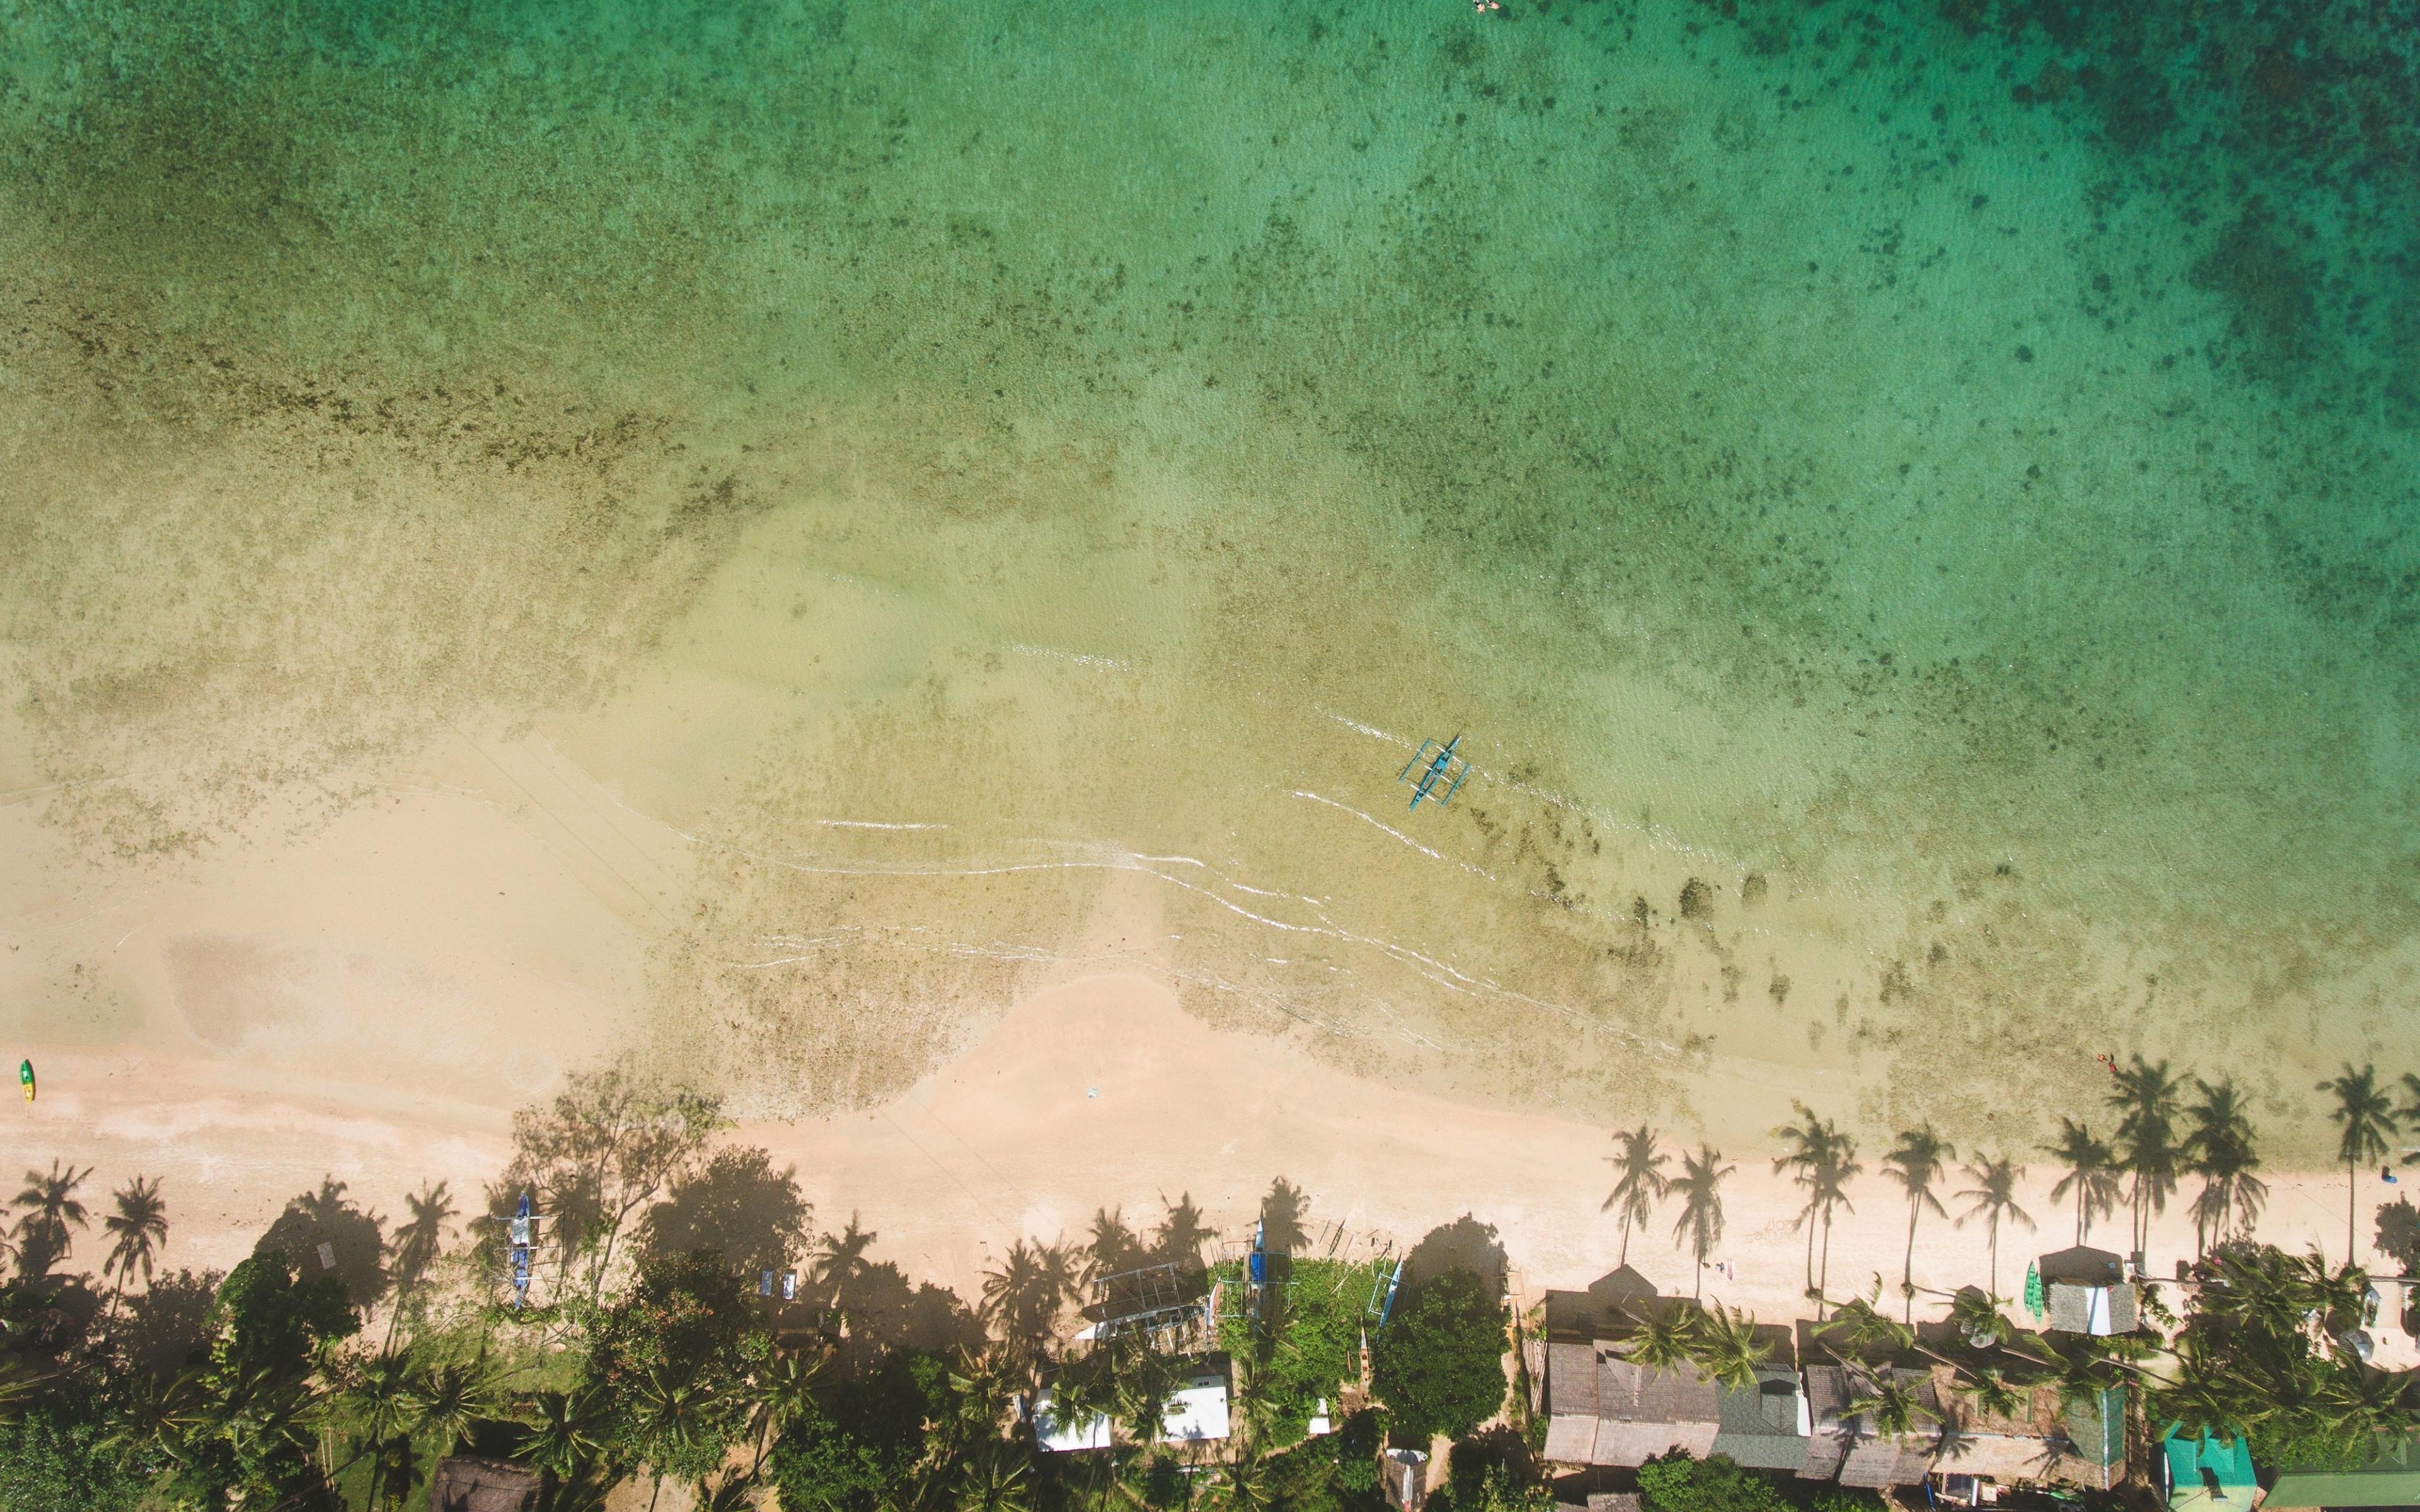 Download 3840x2400 Wallpaper Green Beach Aerial View 4k